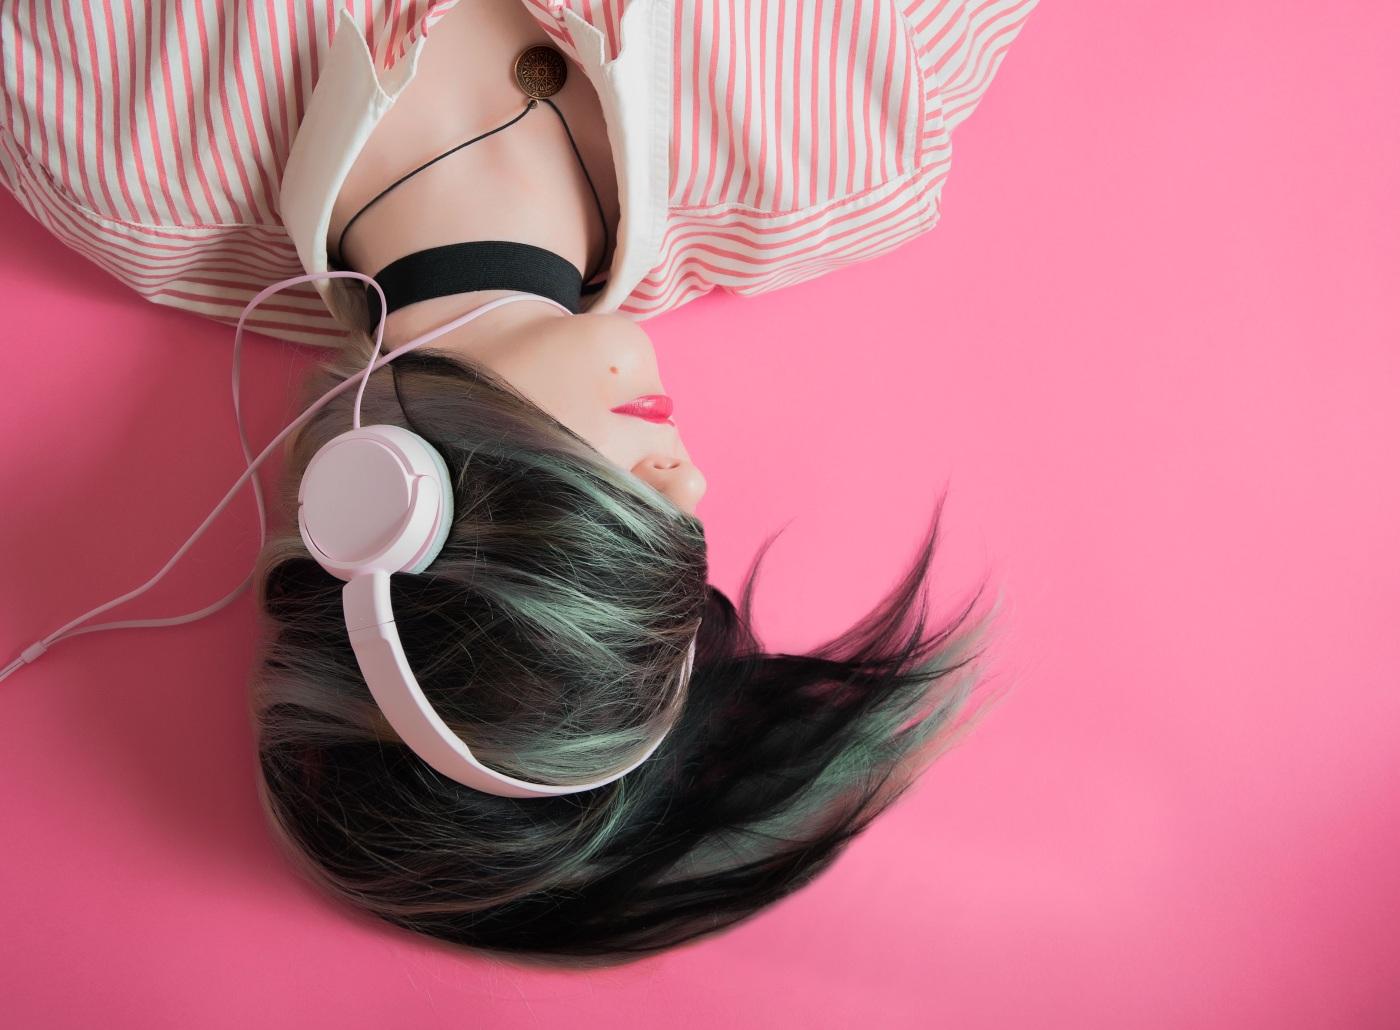 Mendengarkan lagu berbahasa Inggris tanpa teks.jpg